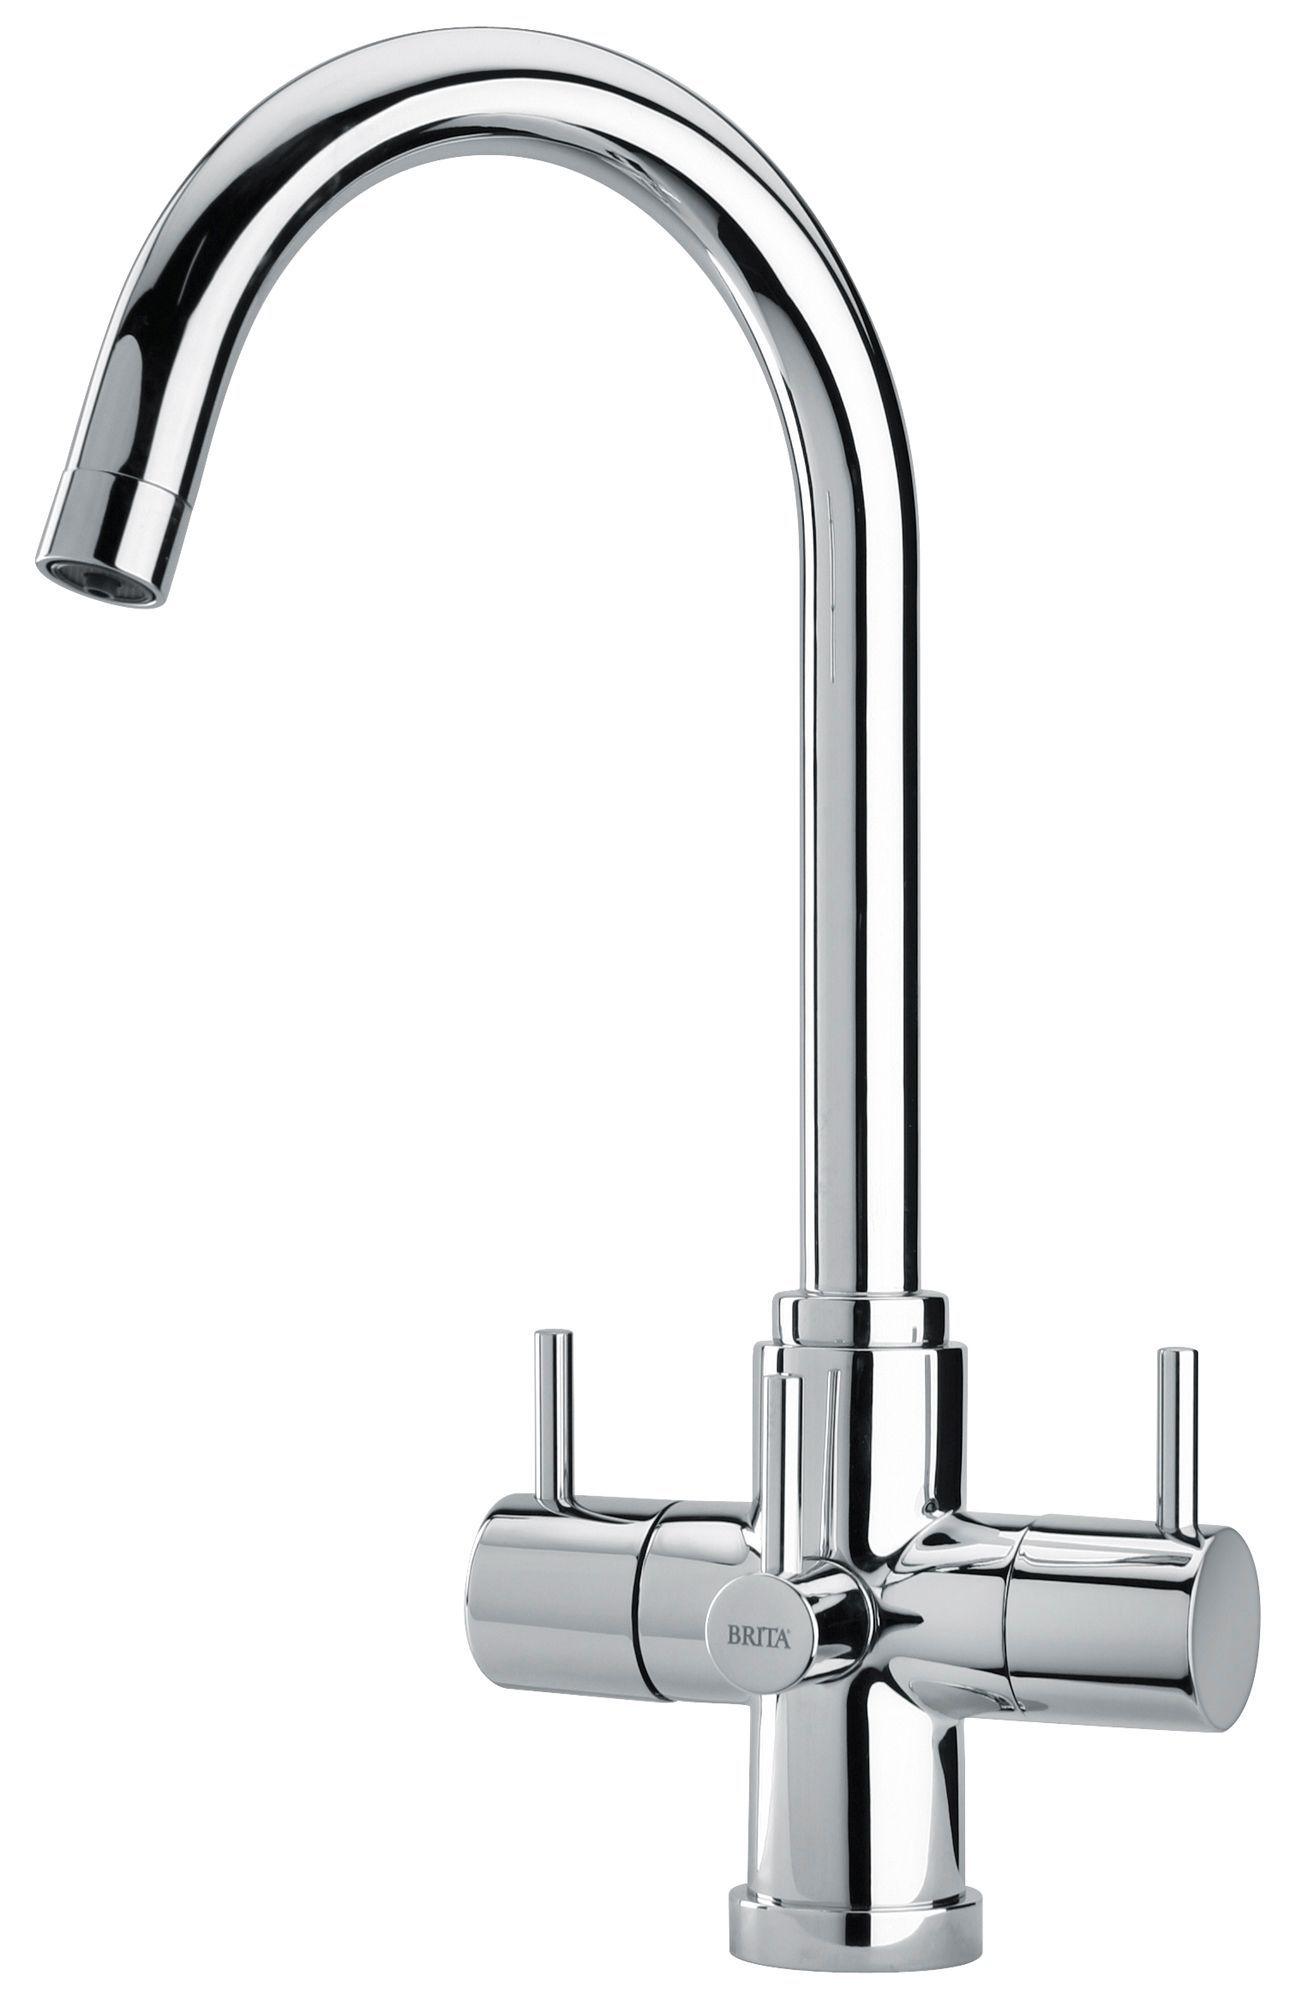 Brita torlan chrome effect water filter tap departments diy at brita torlan kitchen tap chrome effect with cartridge 8000177164965 at bq currently half price workwithnaturefo